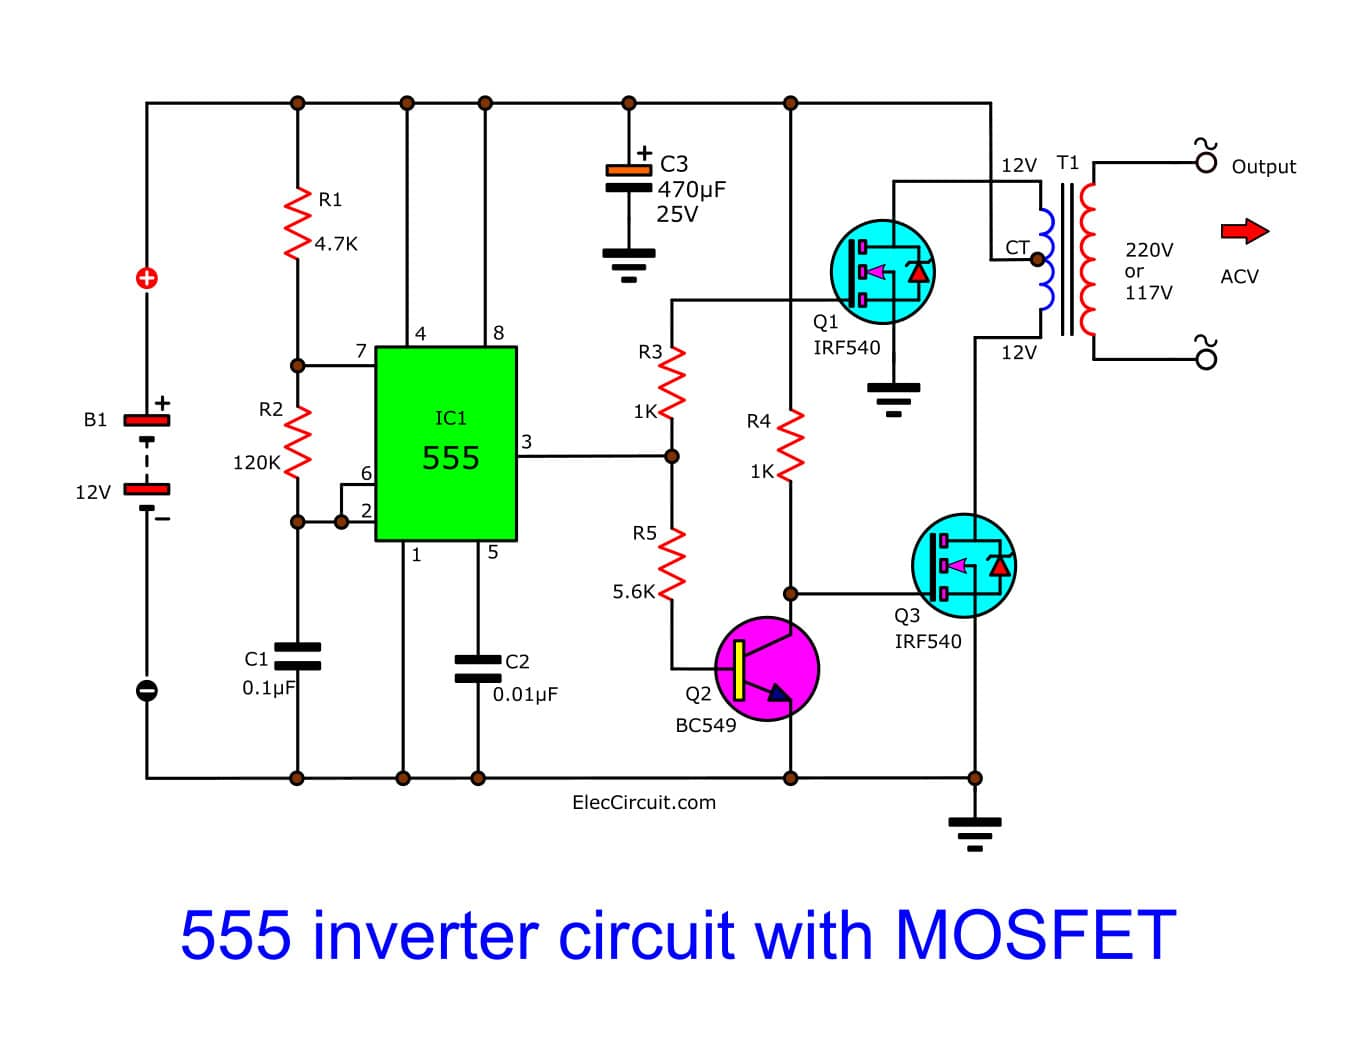 1000 Watts Power Amplifier Schematic Diagrams Ic 555 Inverter Circuit Using Mosfet